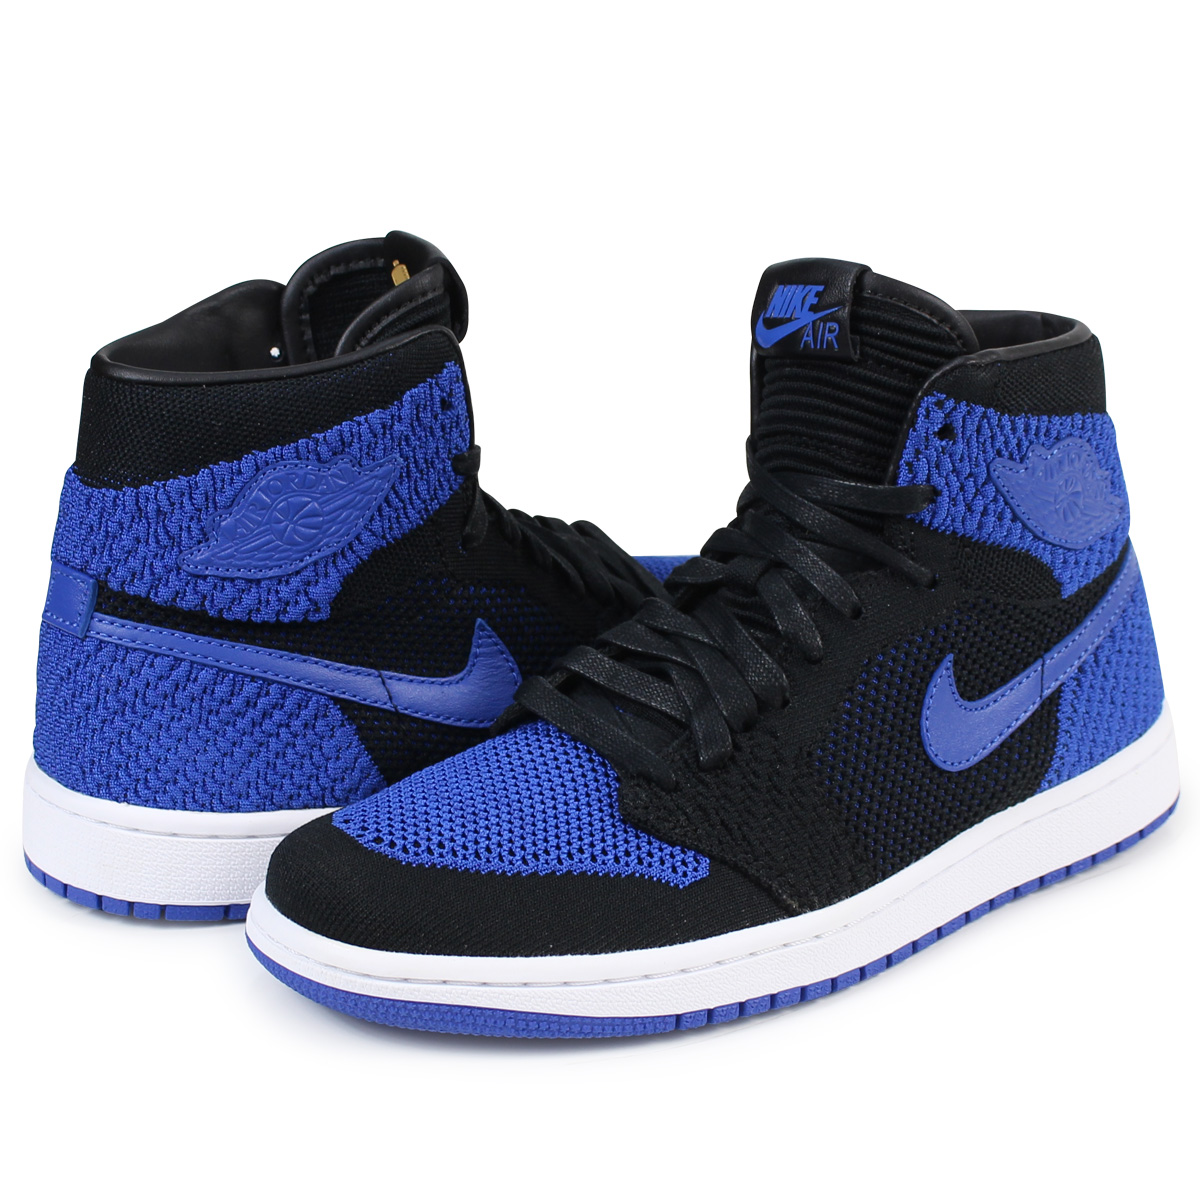 new product 32a7e 5dab7 ALLSPORTS  NIKE AIR JORDAN 1 RETRO HI FLYKNIT BG Nike Air Jordan 1  nostalgic Haile Dis sneakers 919,702-006 shoes blue  load planned Shinnyu  load in ...